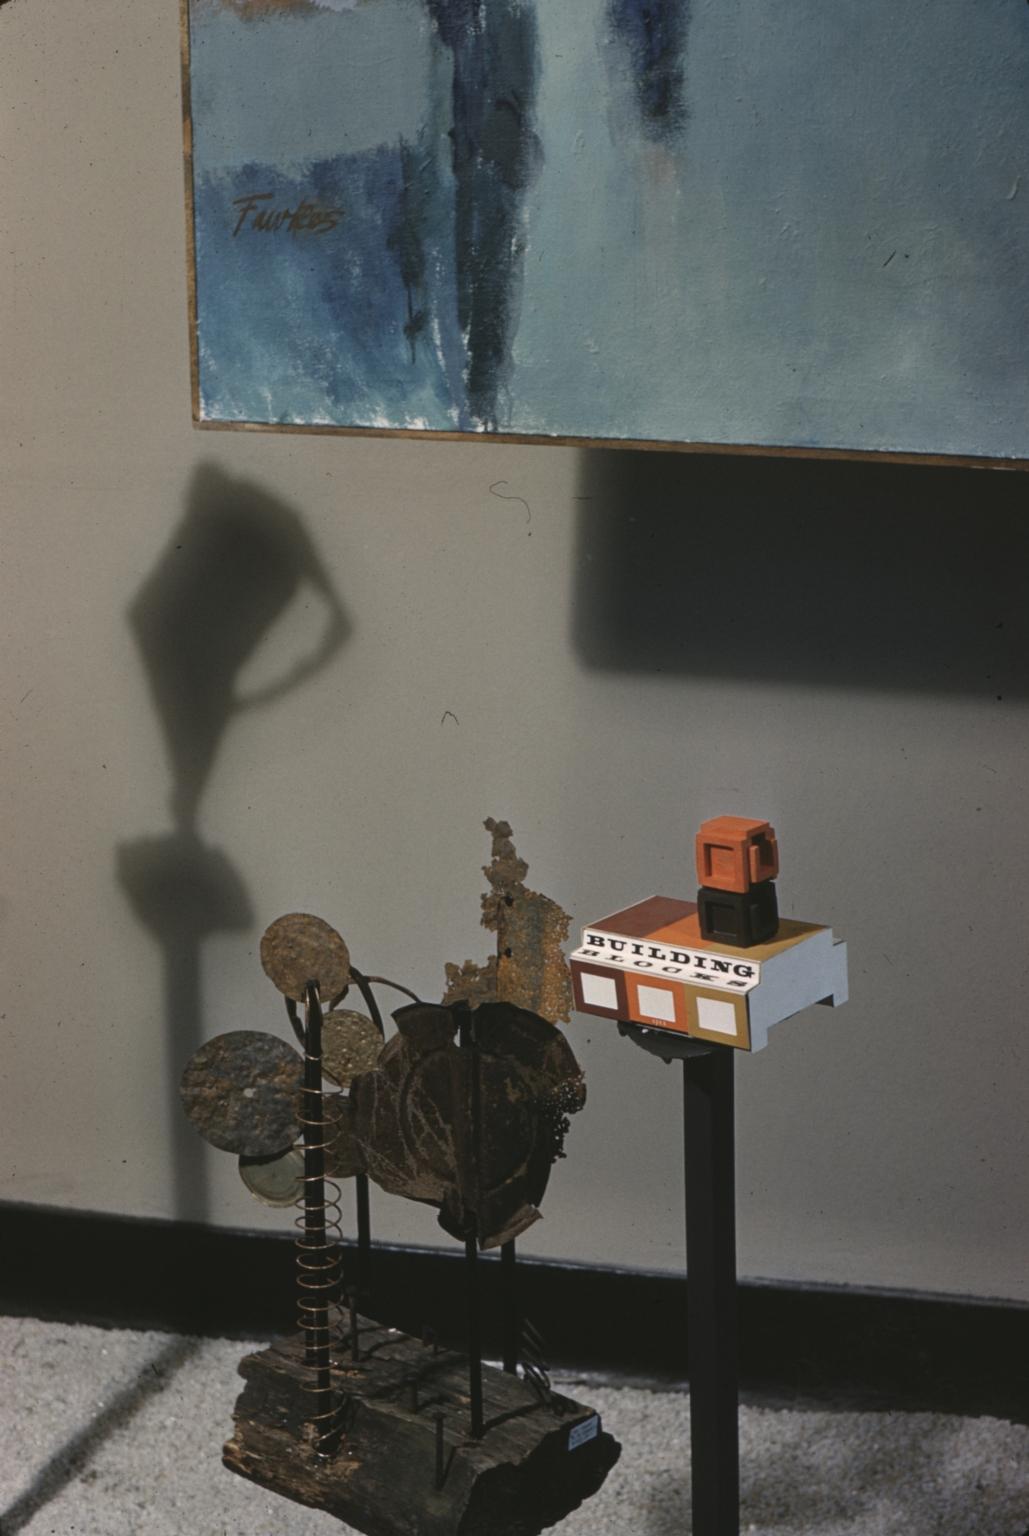 Unidentified Student Artwork